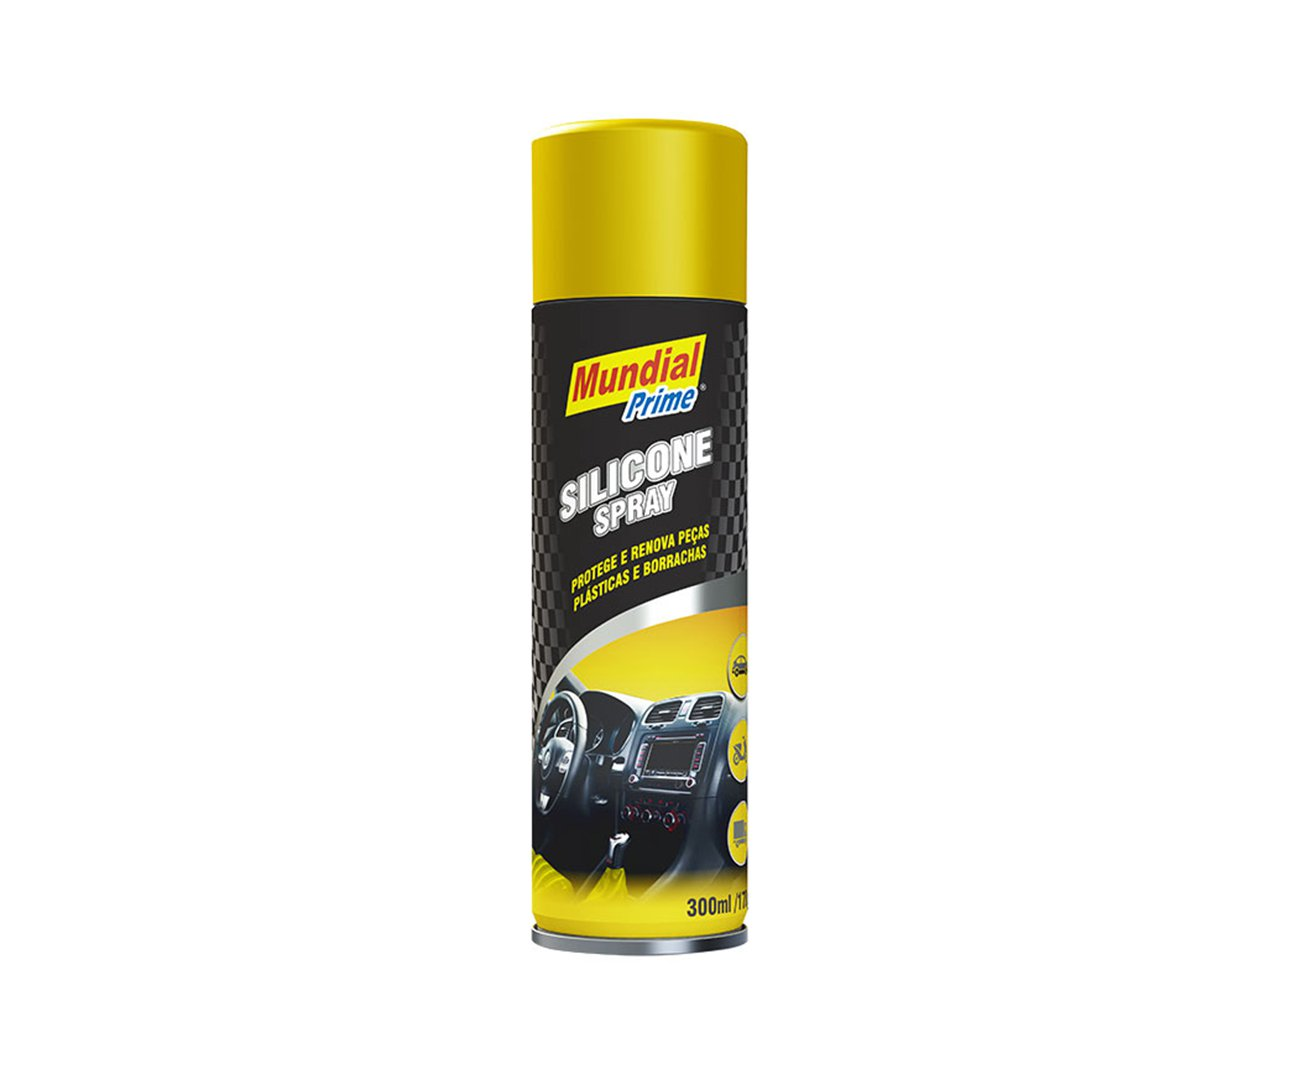 Silicone Spray 300ml - Mundial Prime